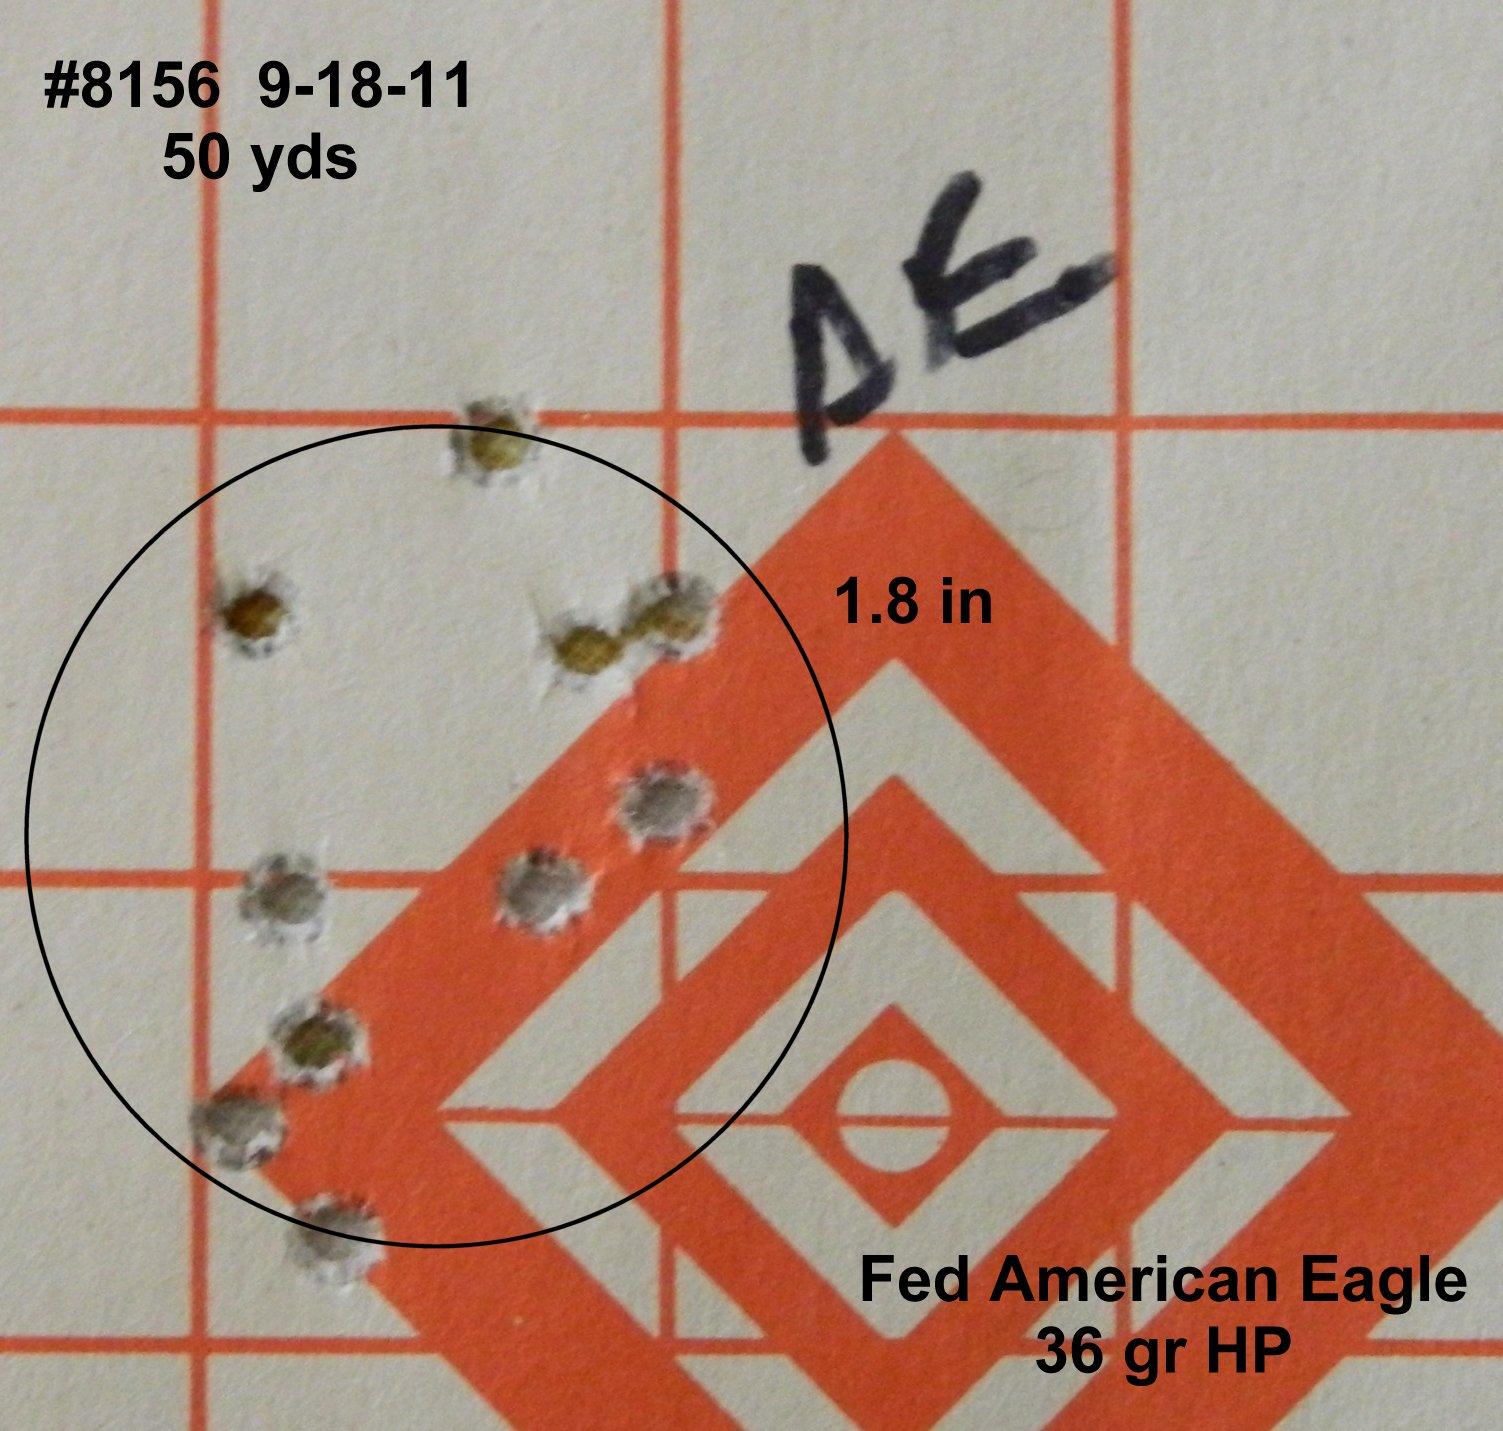 Recording Range scores-8156-ameagle-1.jpg